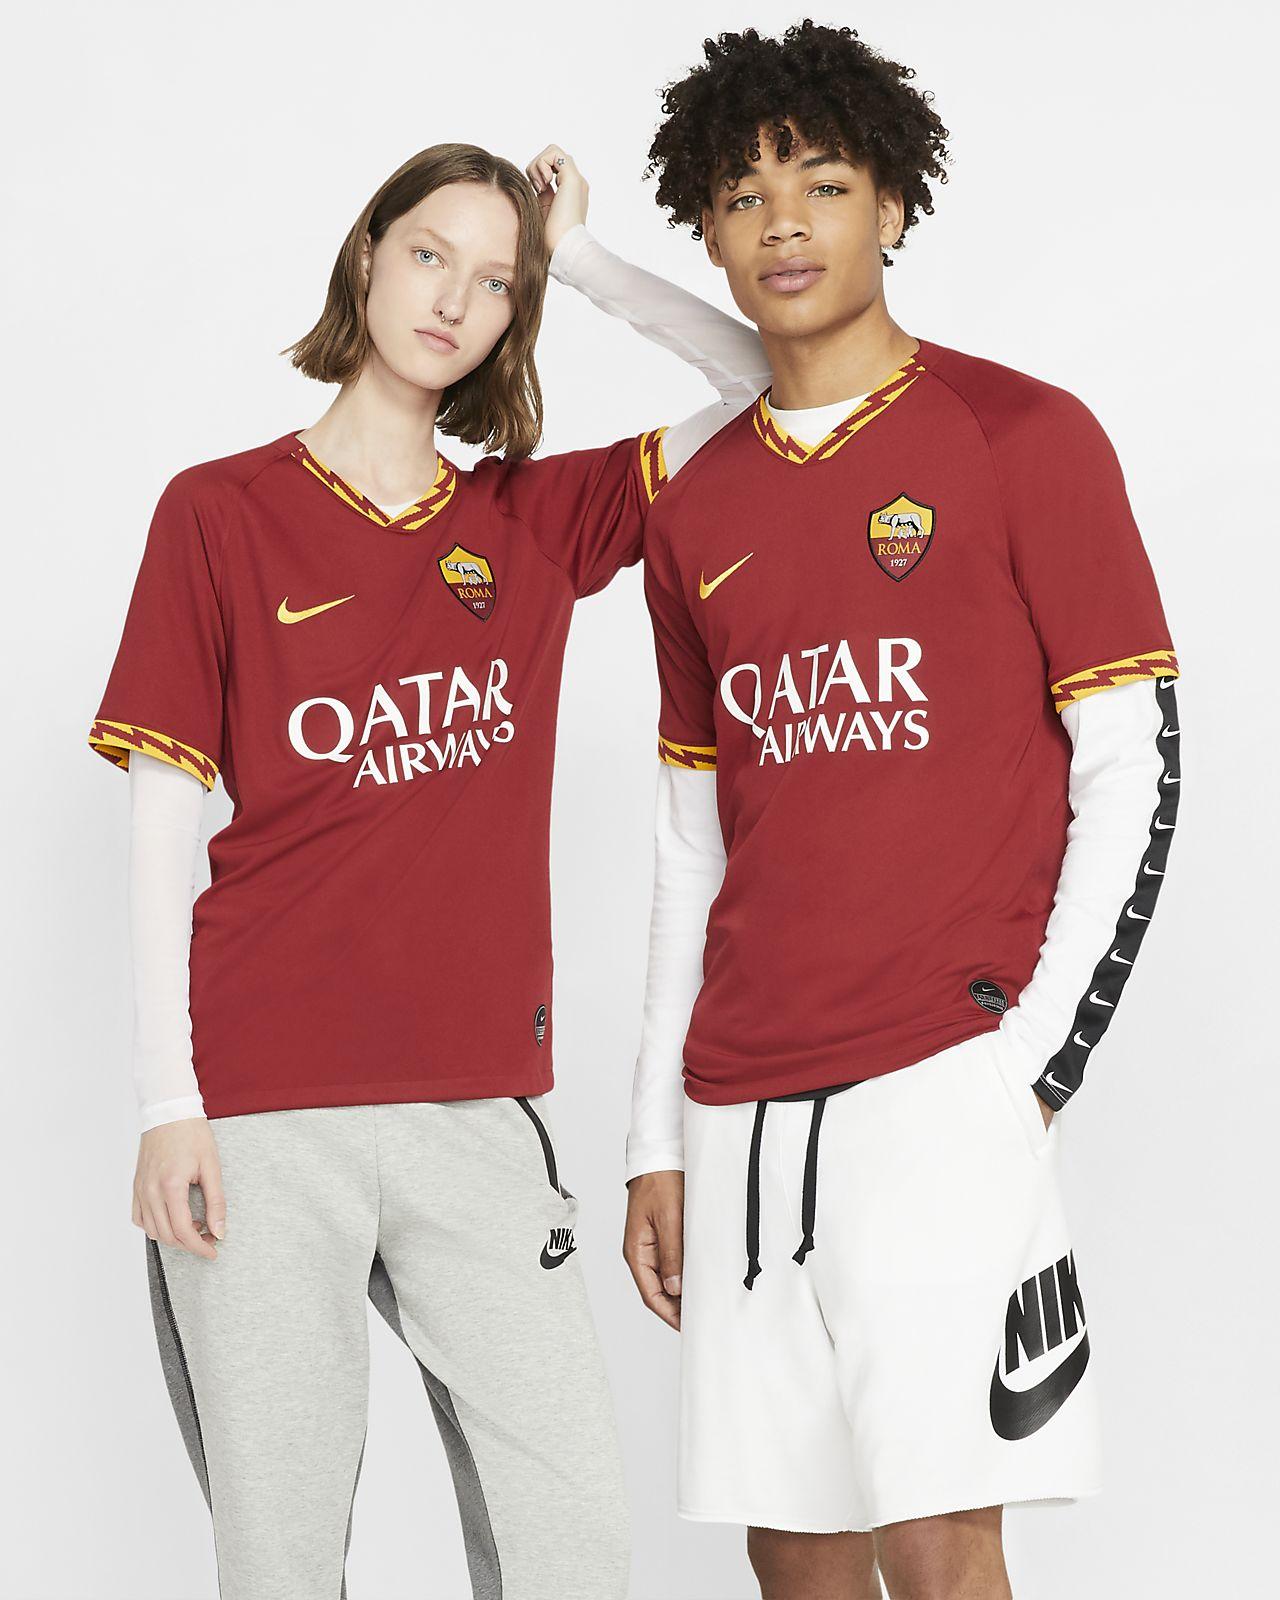 A.S. Roma 2019/20 Stadium Home Futbol Forması